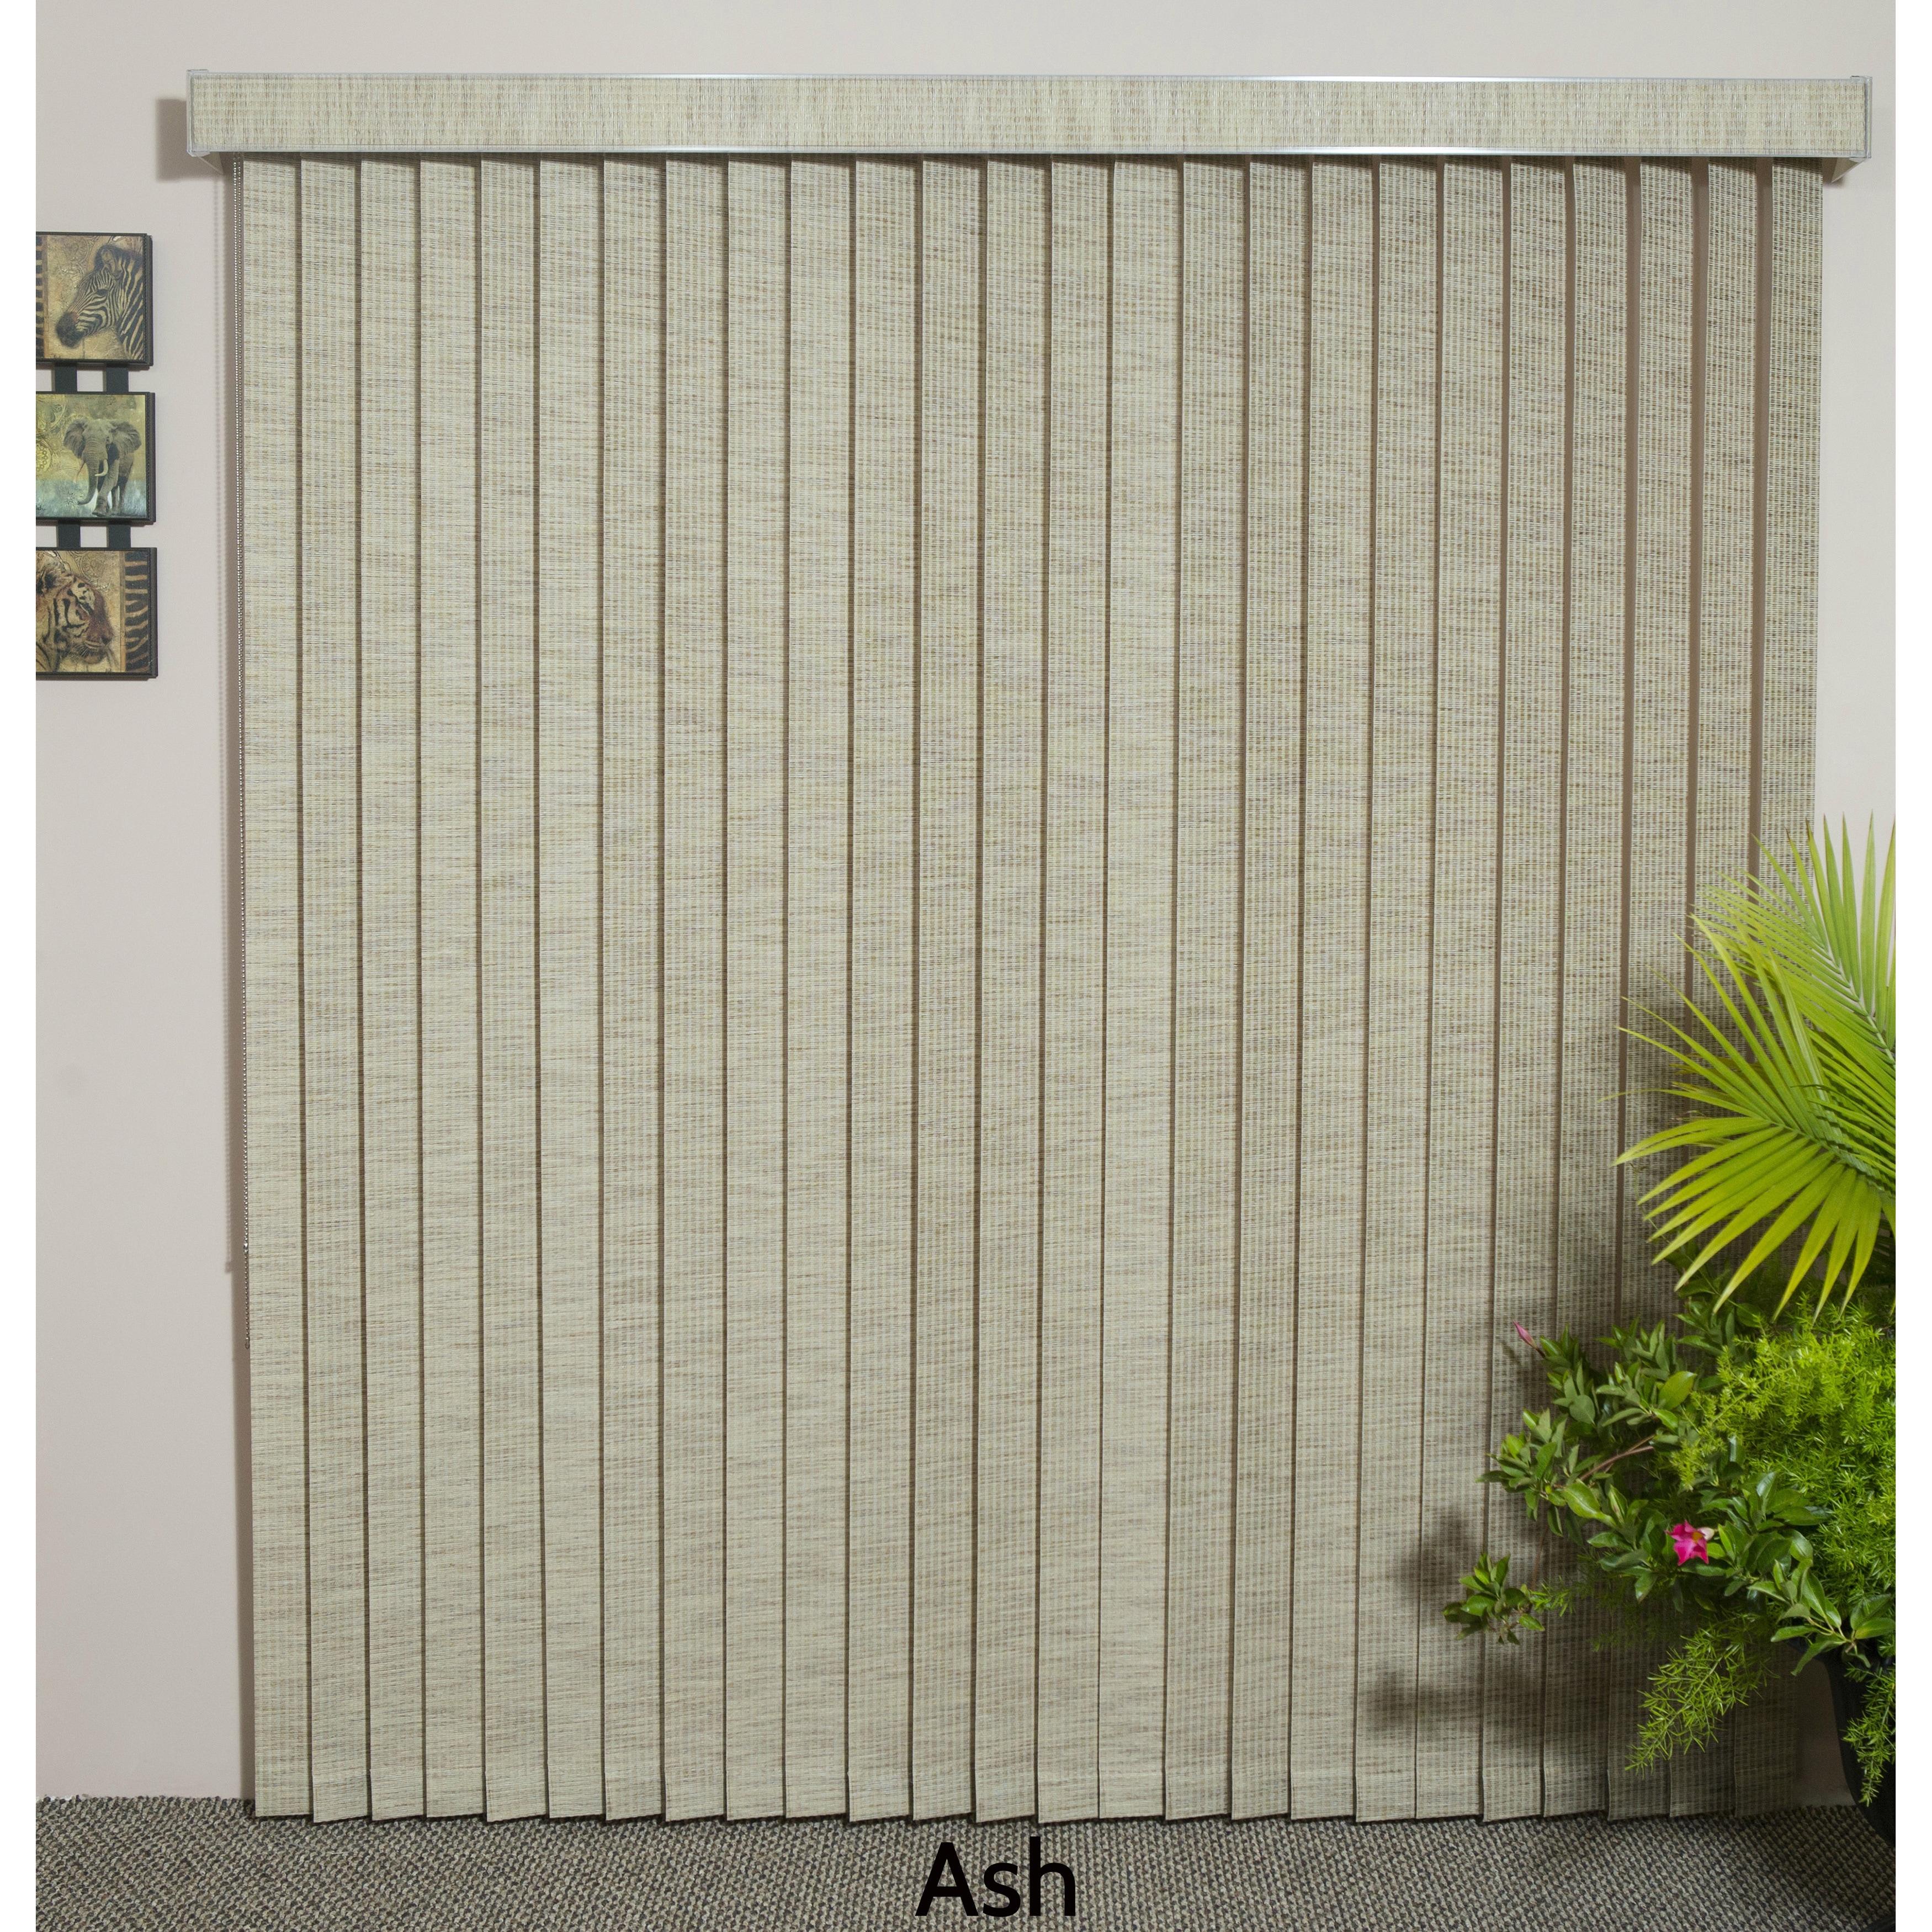 94 inch wide blinds vinyl shop vertical blinds edinborough 12